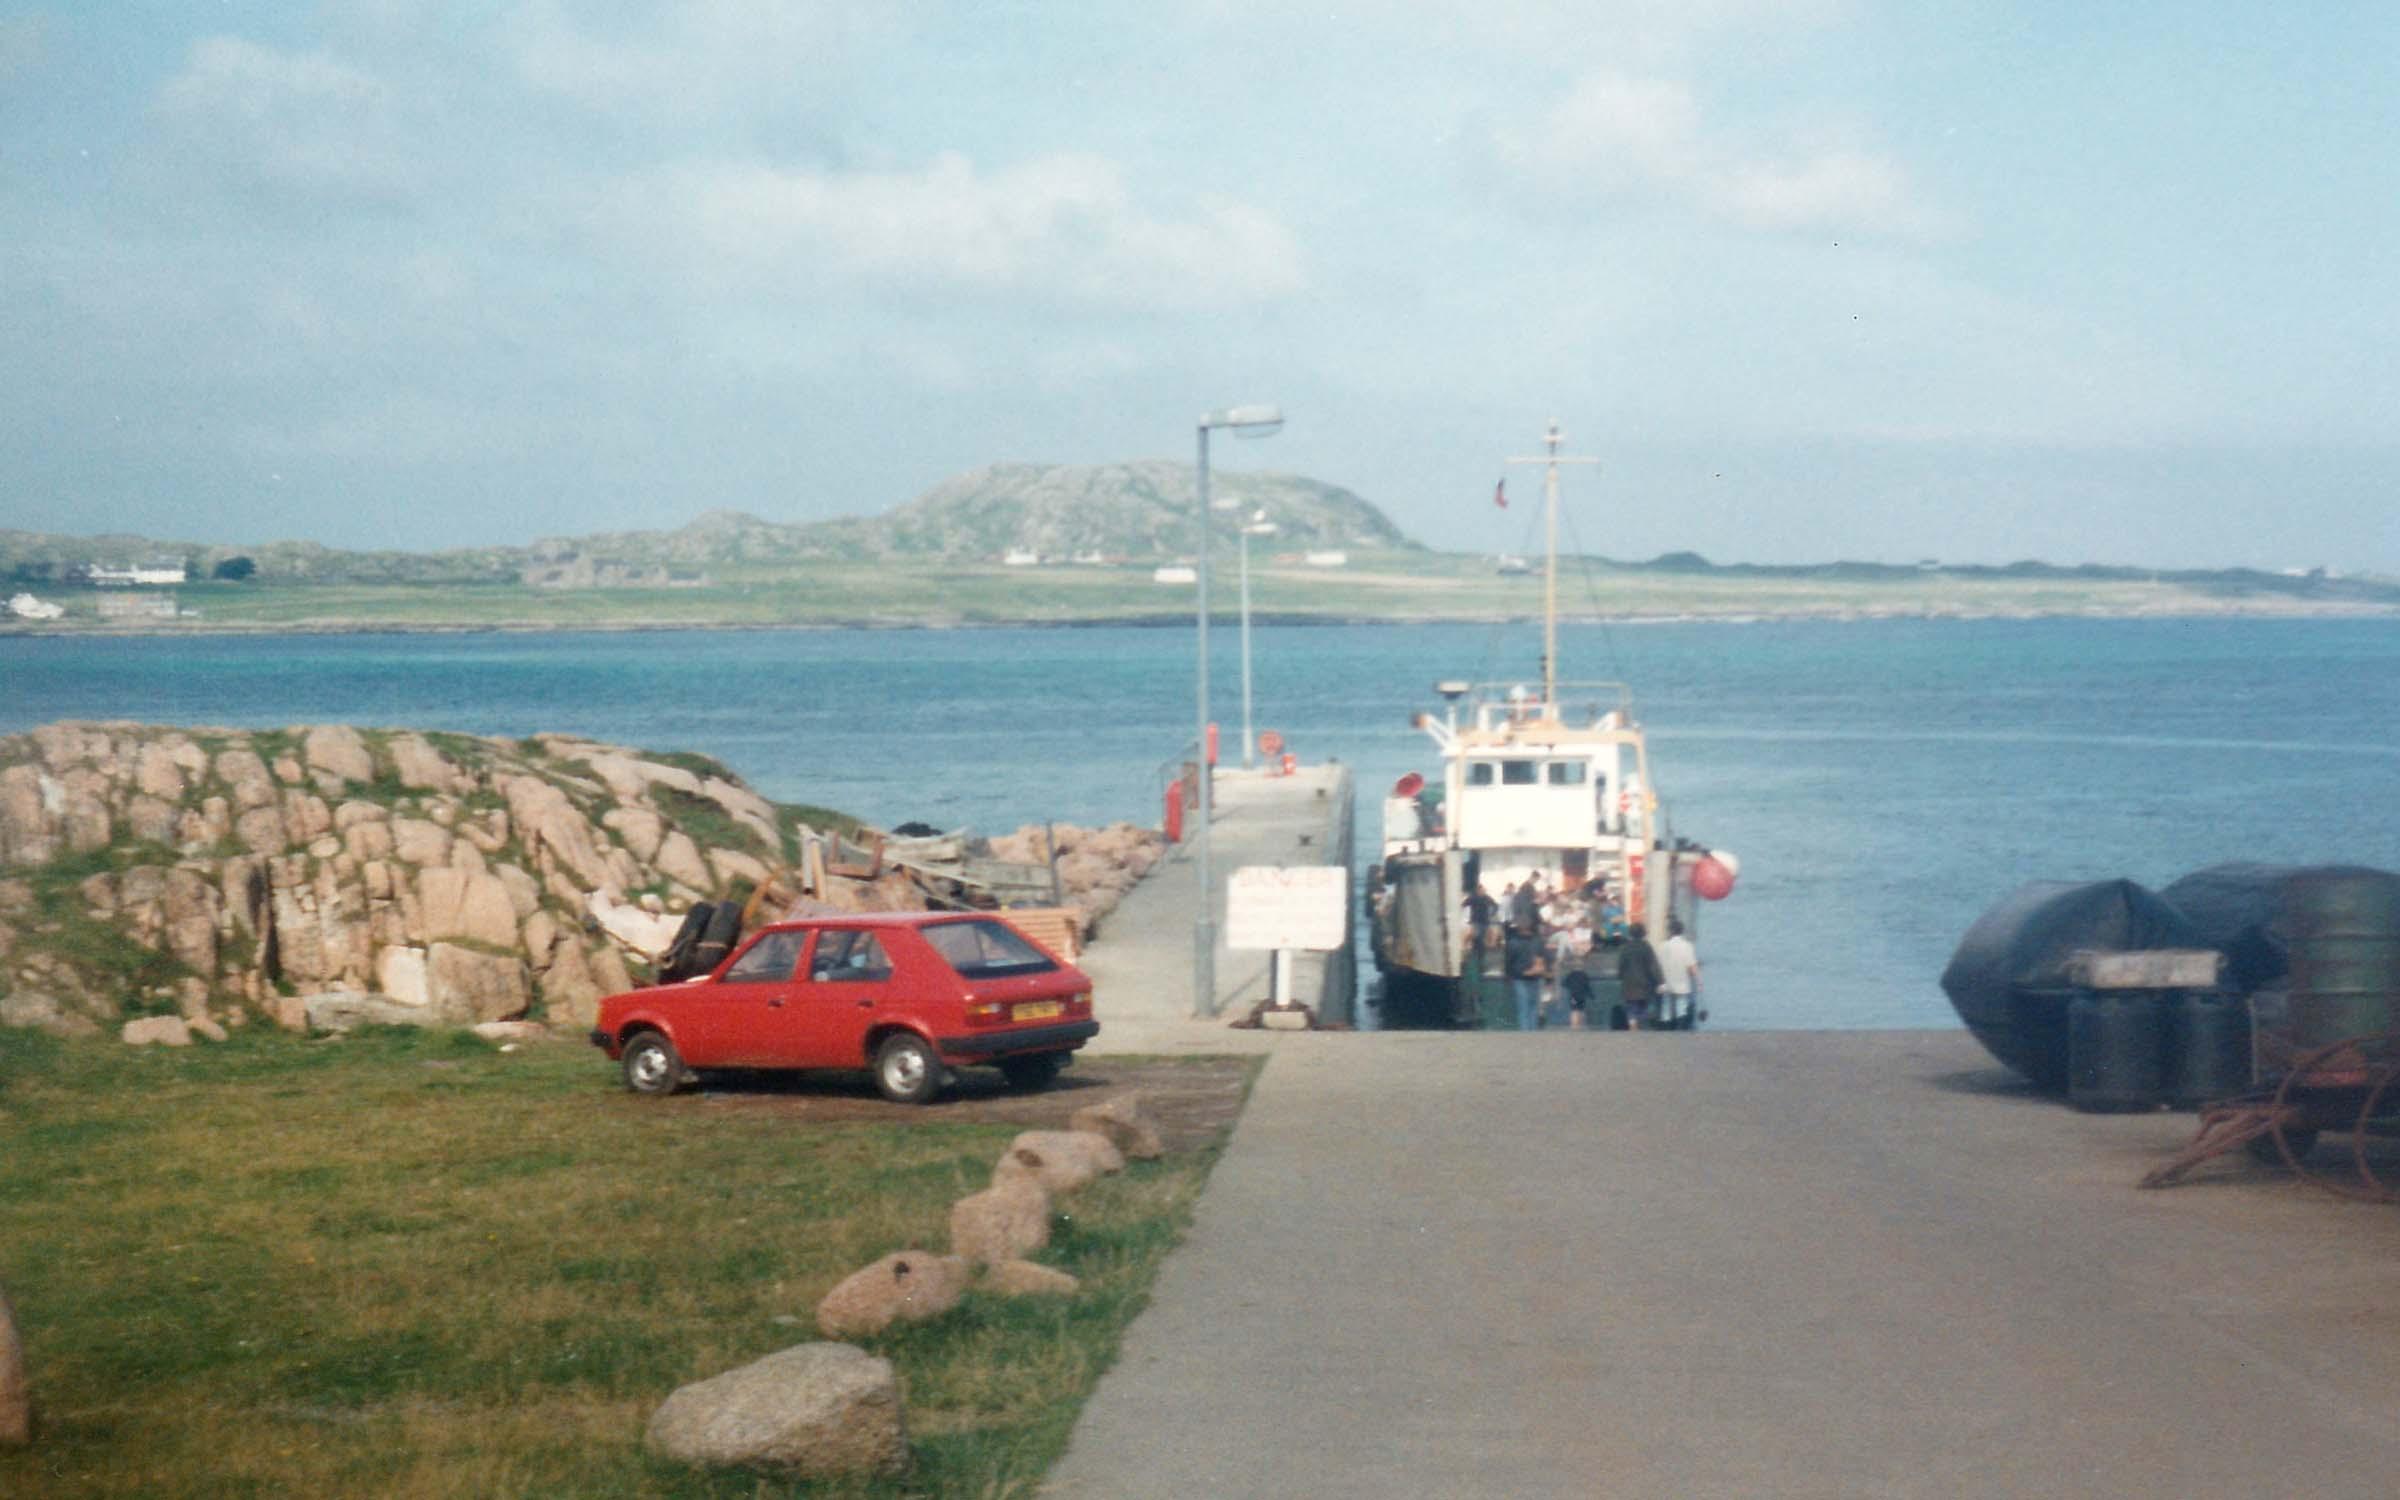 Morvern at Fionnphort slipway (Ships of CalMac)